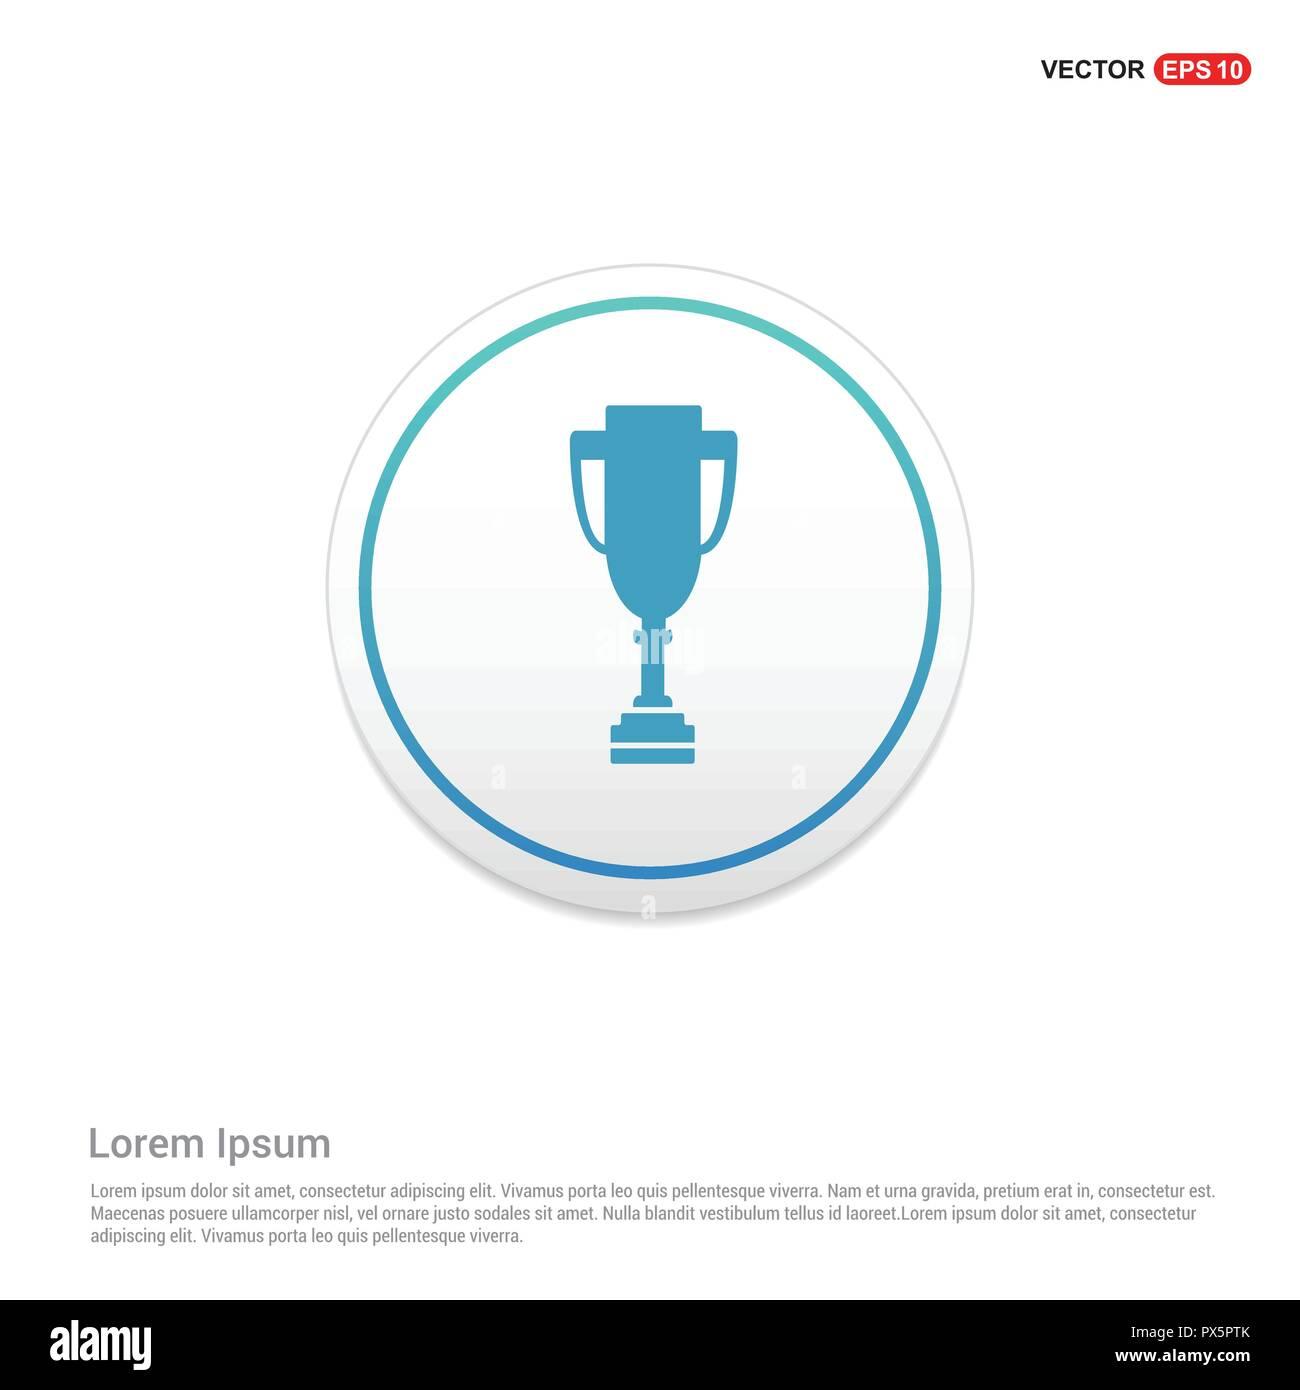 trophy icon hexa white background icon template free vector icon